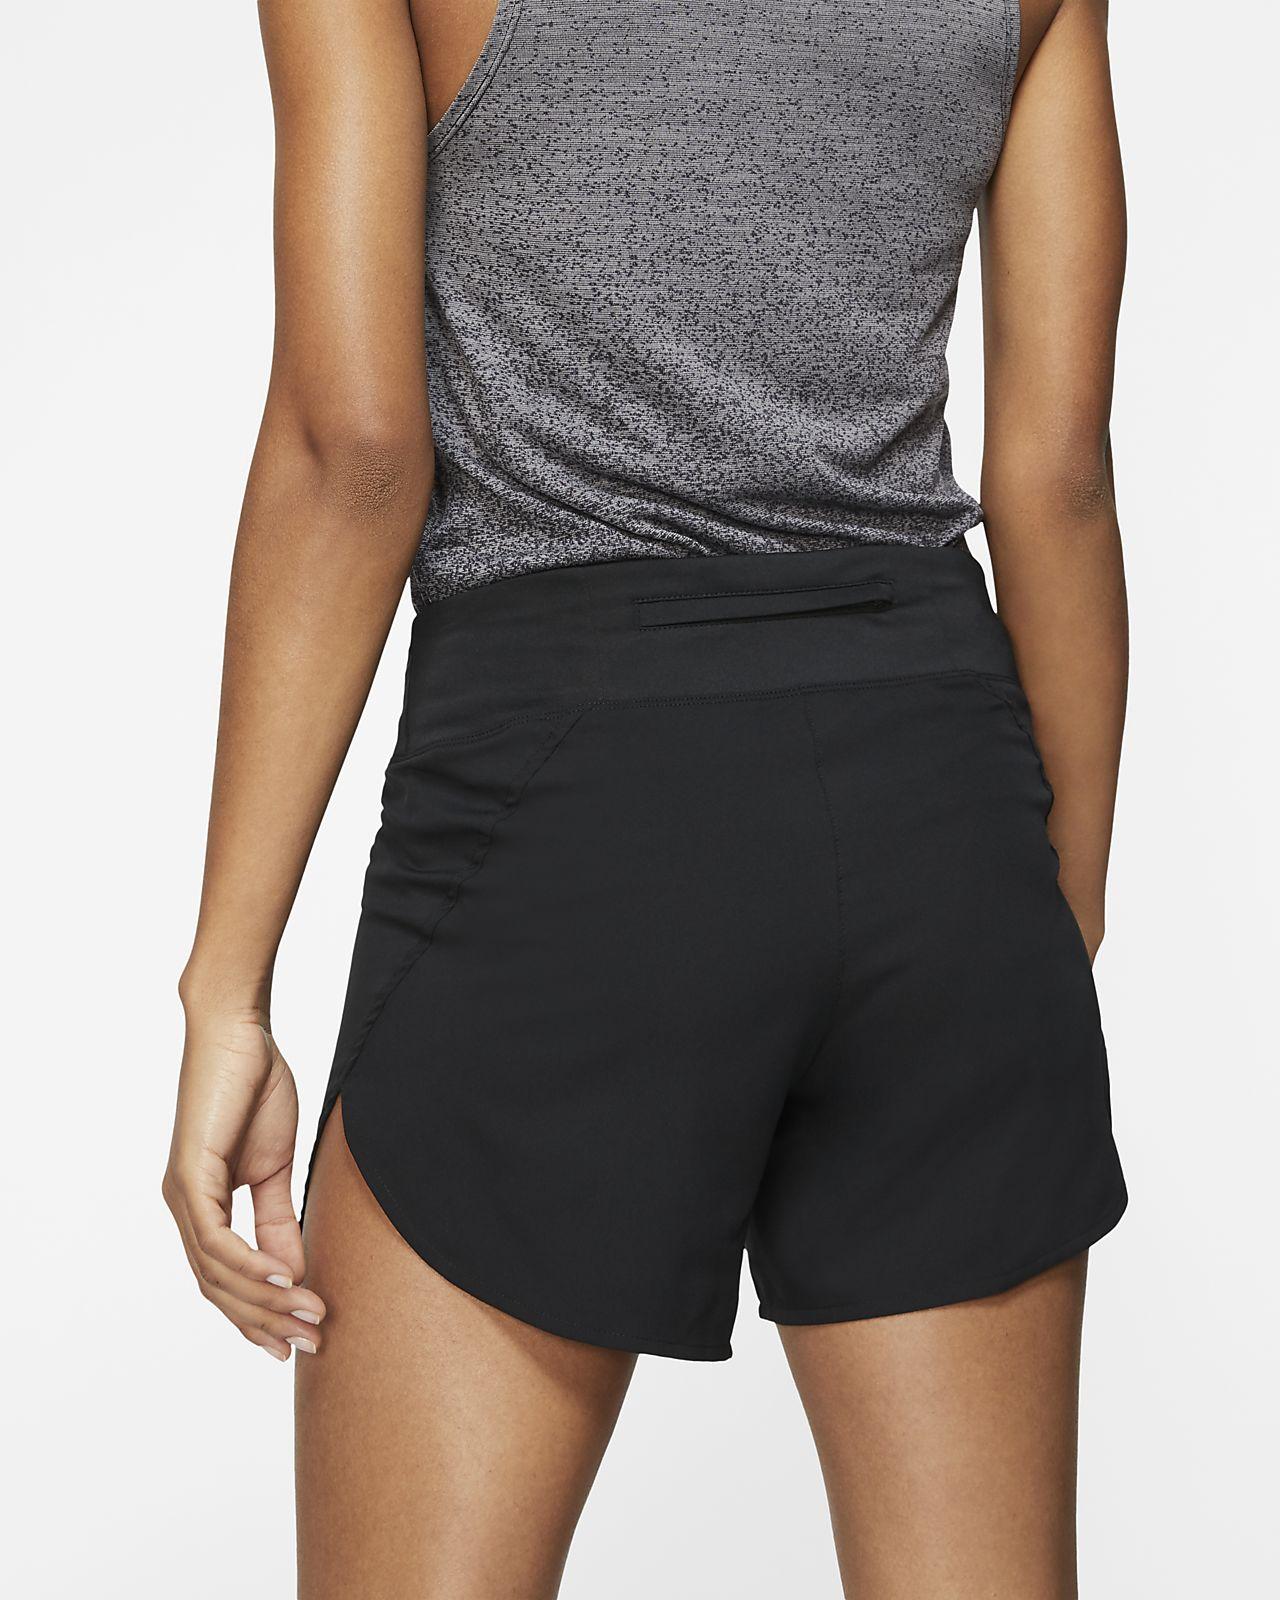 nike 6 inch shorts womens